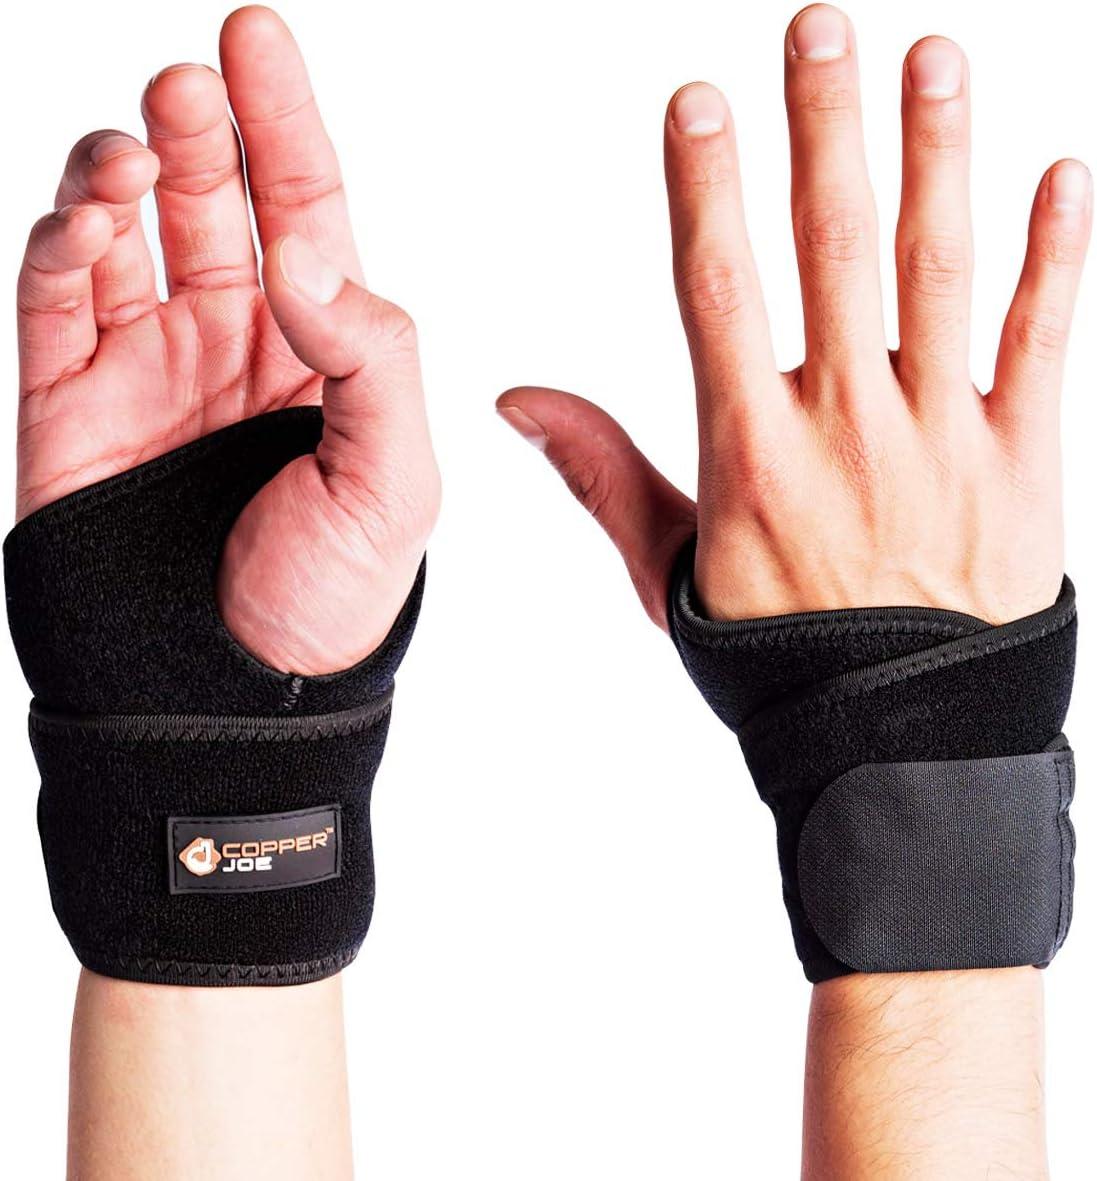 Copper Joe Attention brand Wrist Strap Brace Sale Support- Hand High Wrap